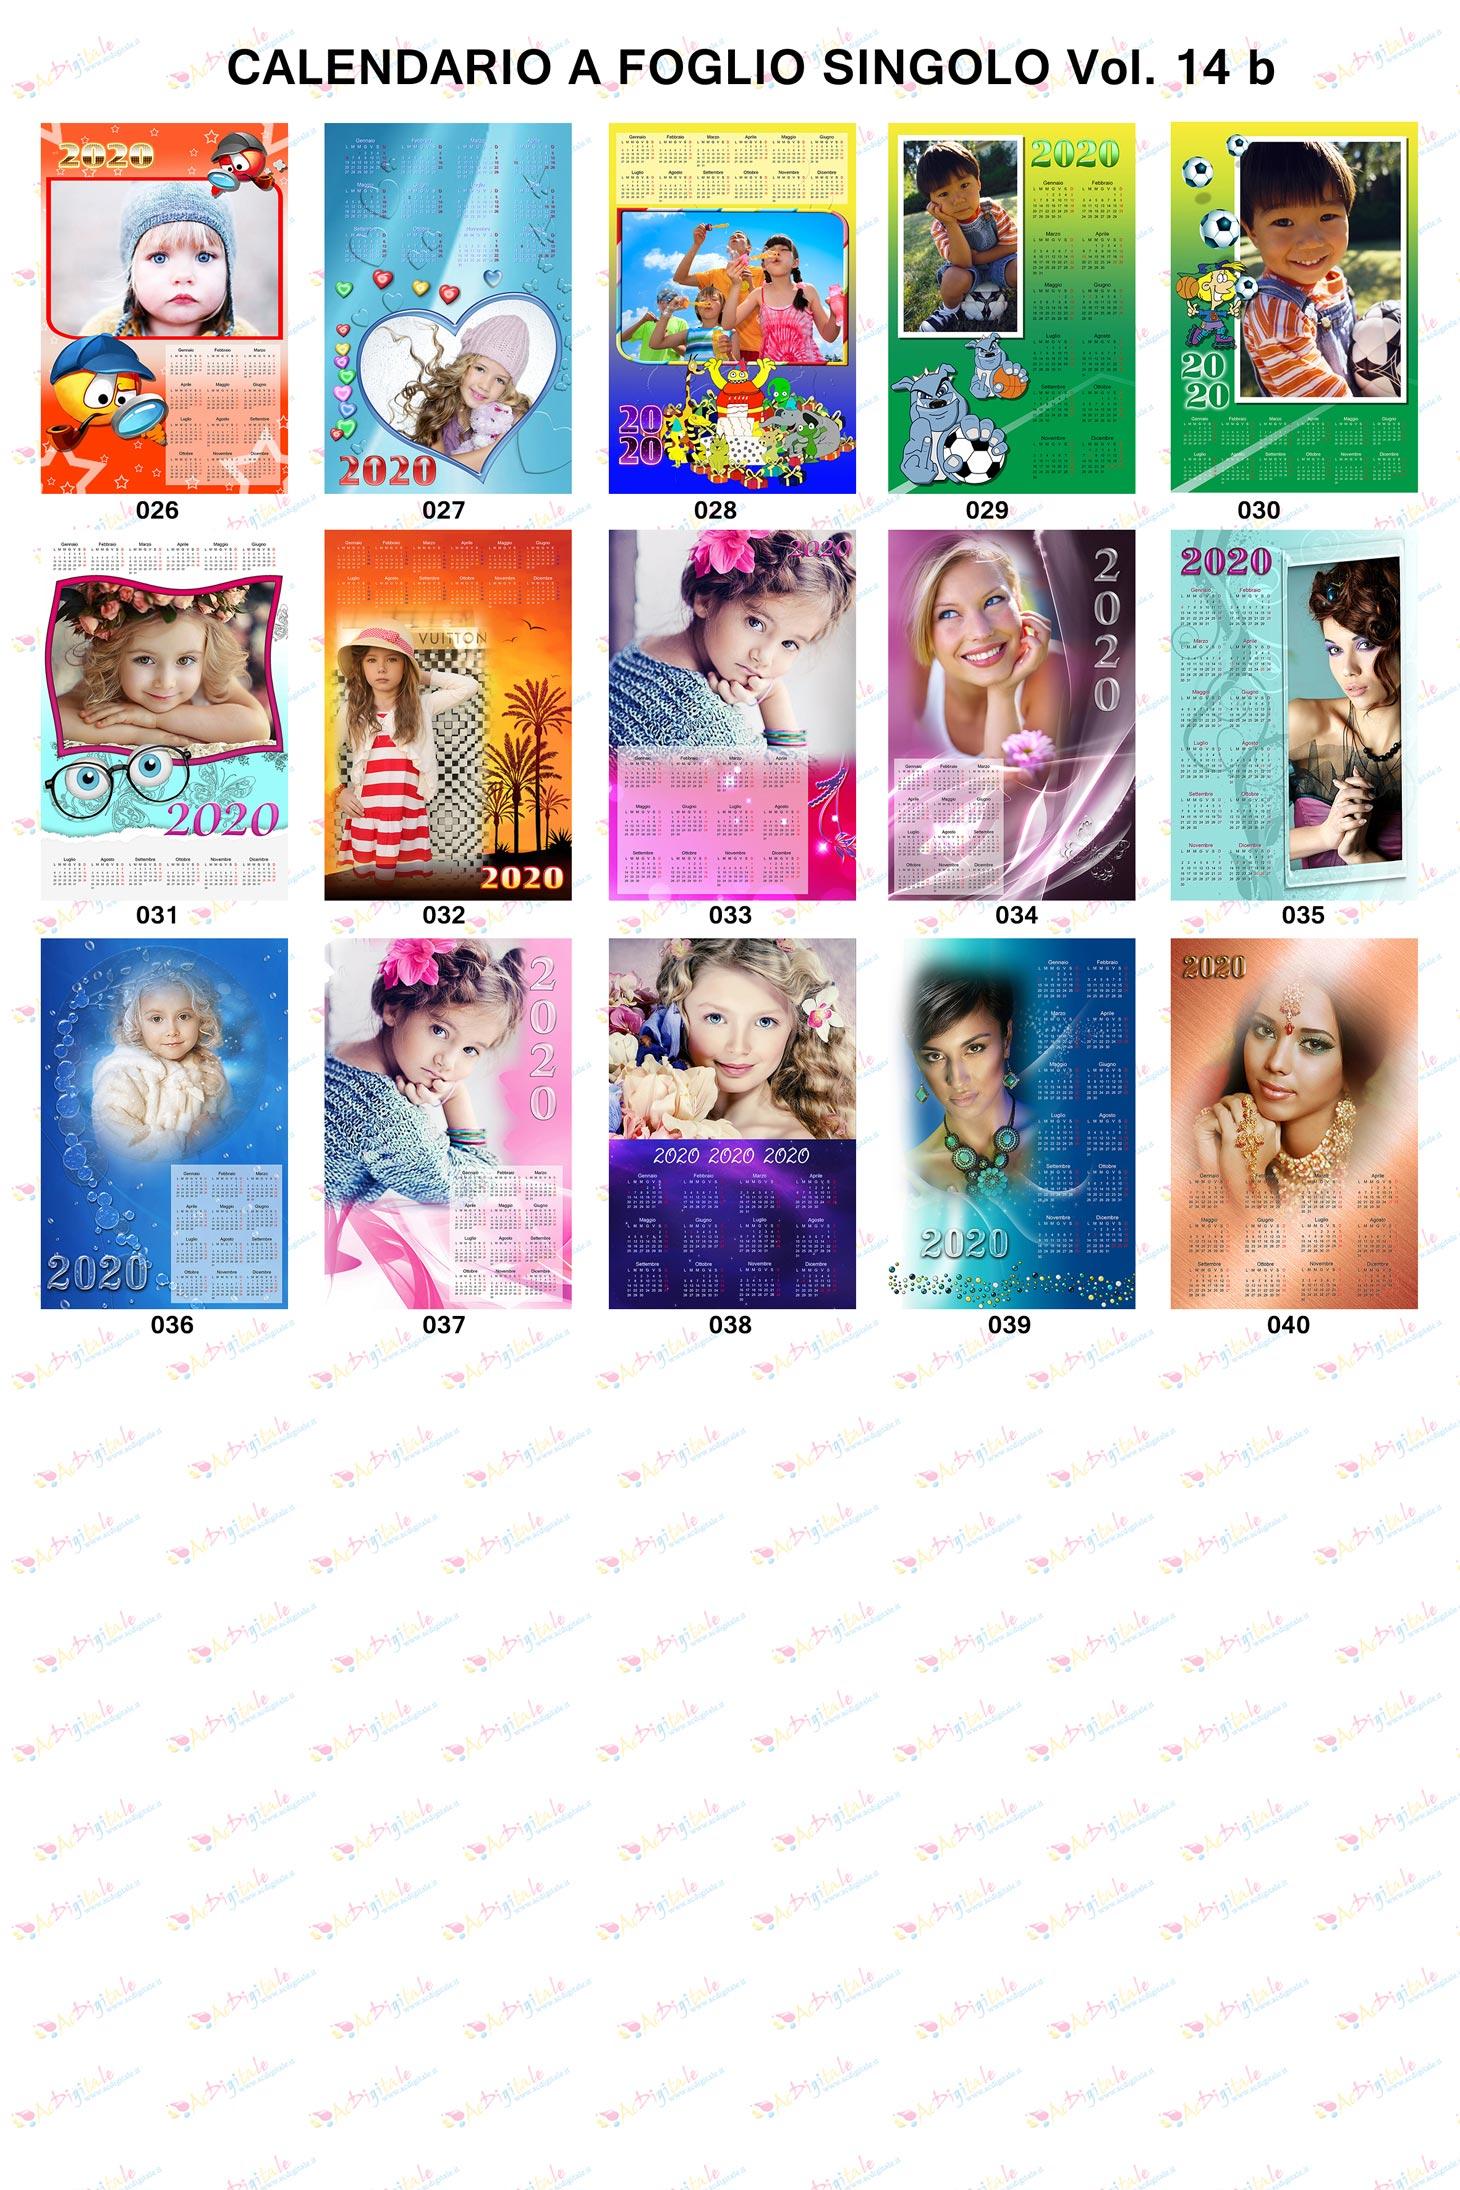 Anteprima Calendari Personalizzati 2020 Volume 14b